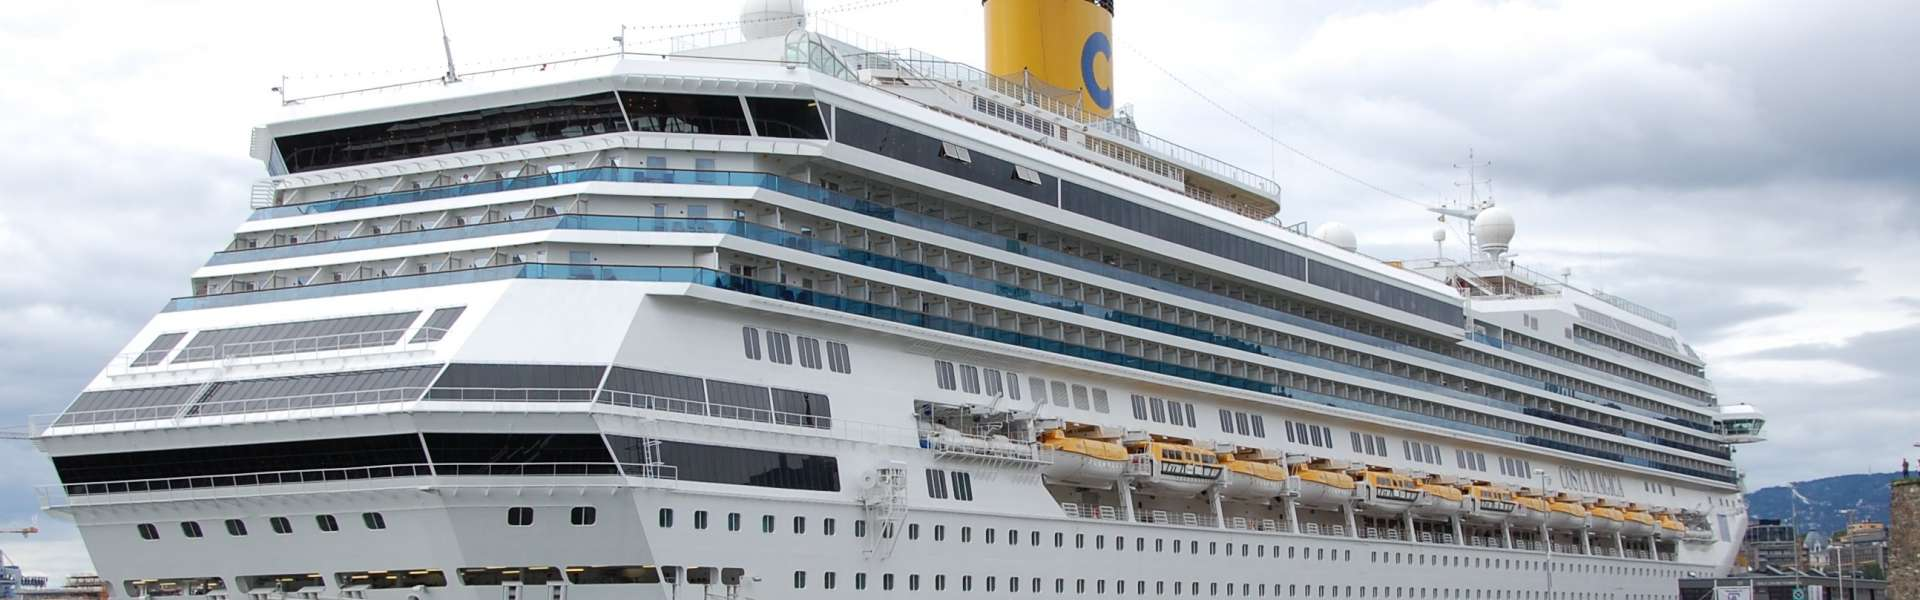 Croaziera 2019 - Mediterana de Vest (Barcelona) - Costa Cruises - Costa Magica - 7 nopti